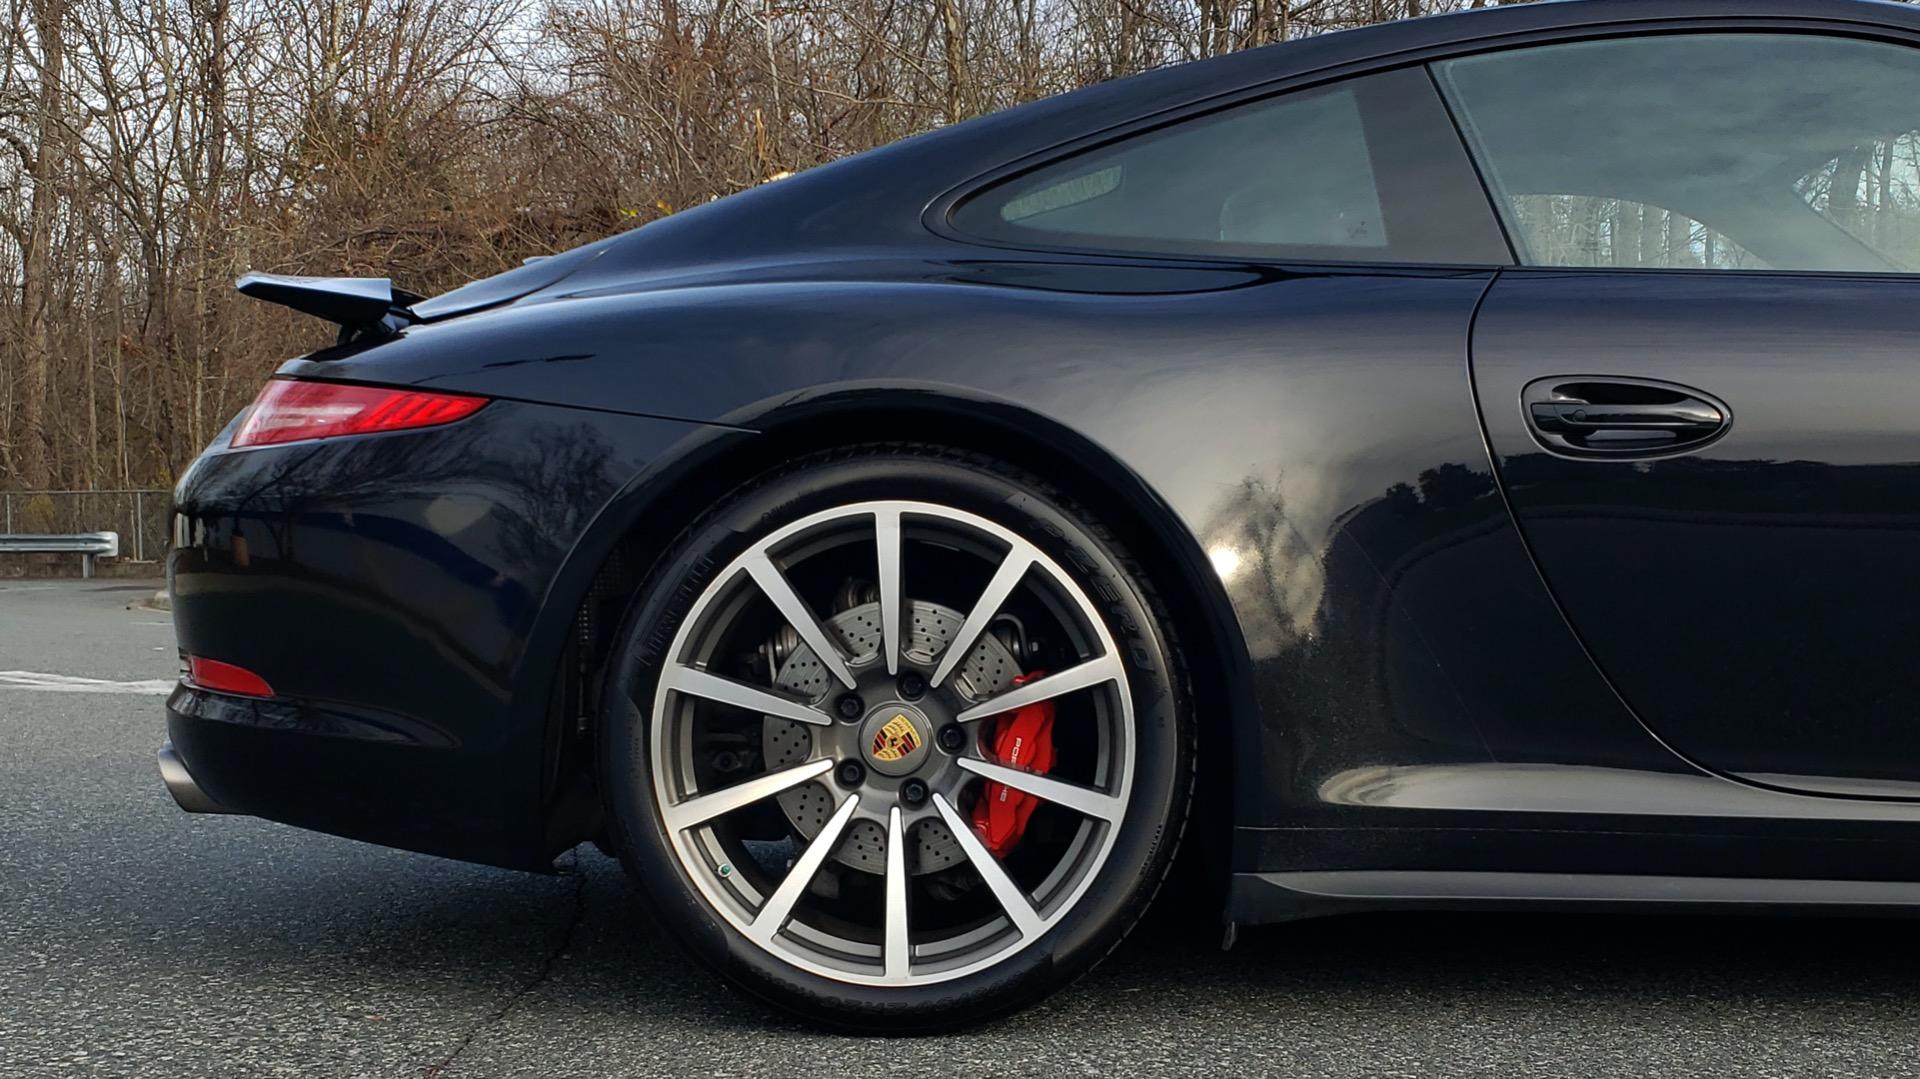 Used 2014 Porsche 911 CARRERA 4S / PREM PKG PLUS / NAV / SUNROO / BOSE / CHRONO for sale Sold at Formula Imports in Charlotte NC 28227 72